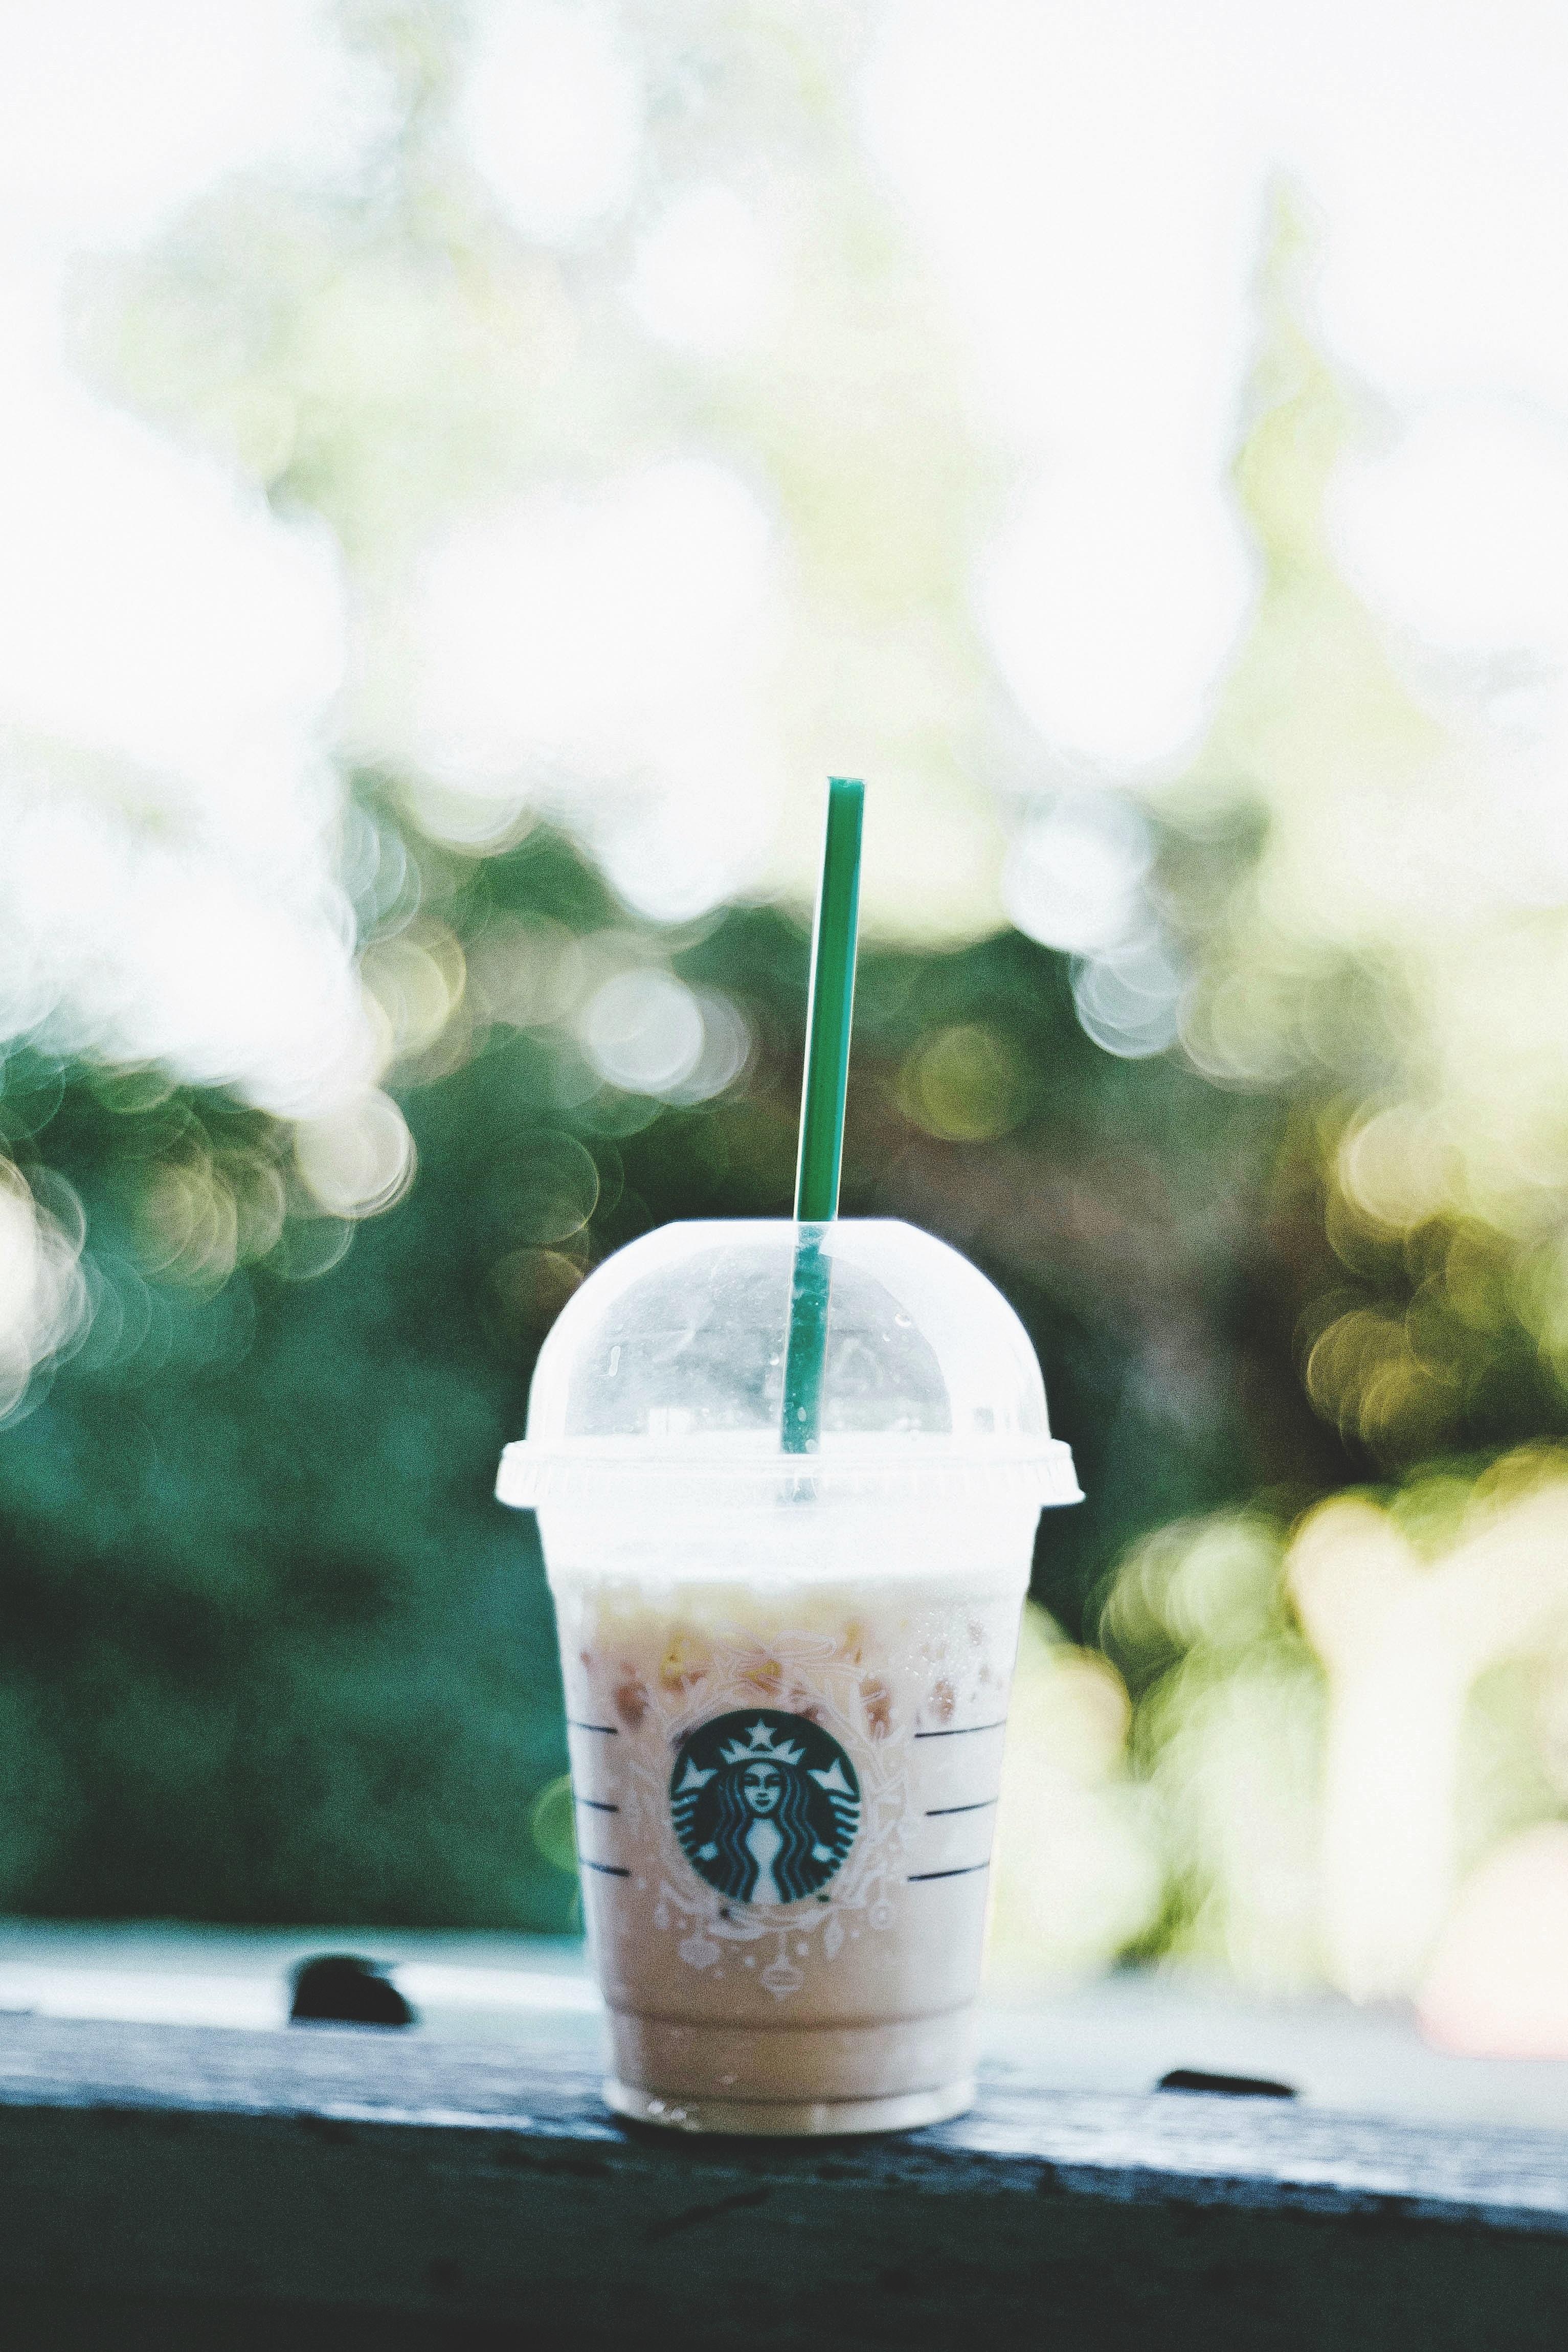 Starbucks smoothie on gray bench bokeh photography